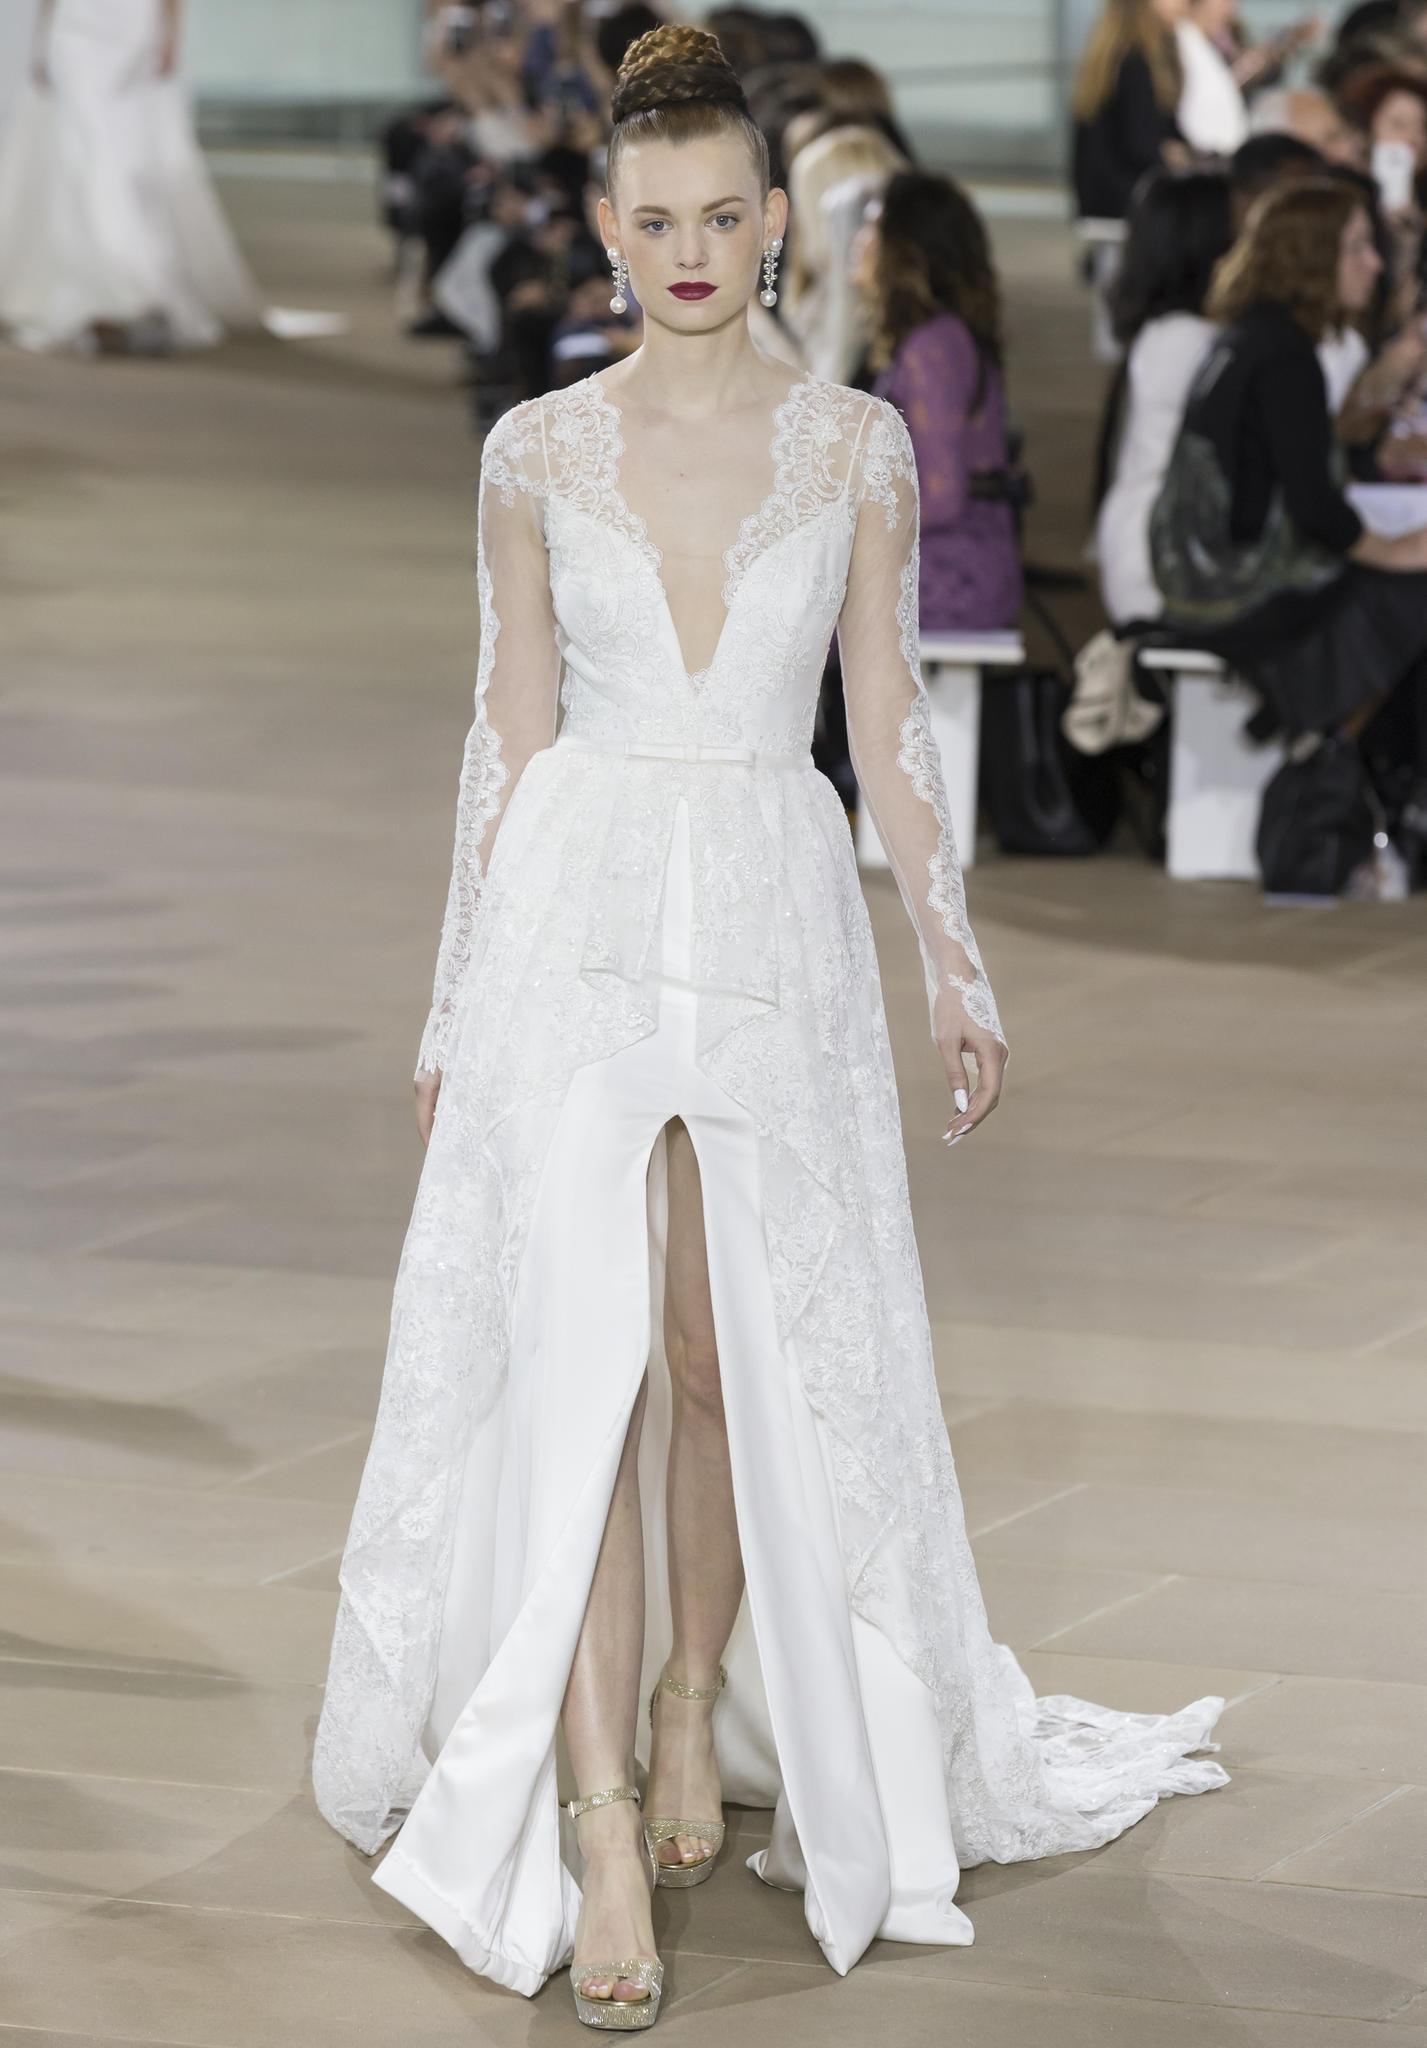 Frau im weißen Brautkleid